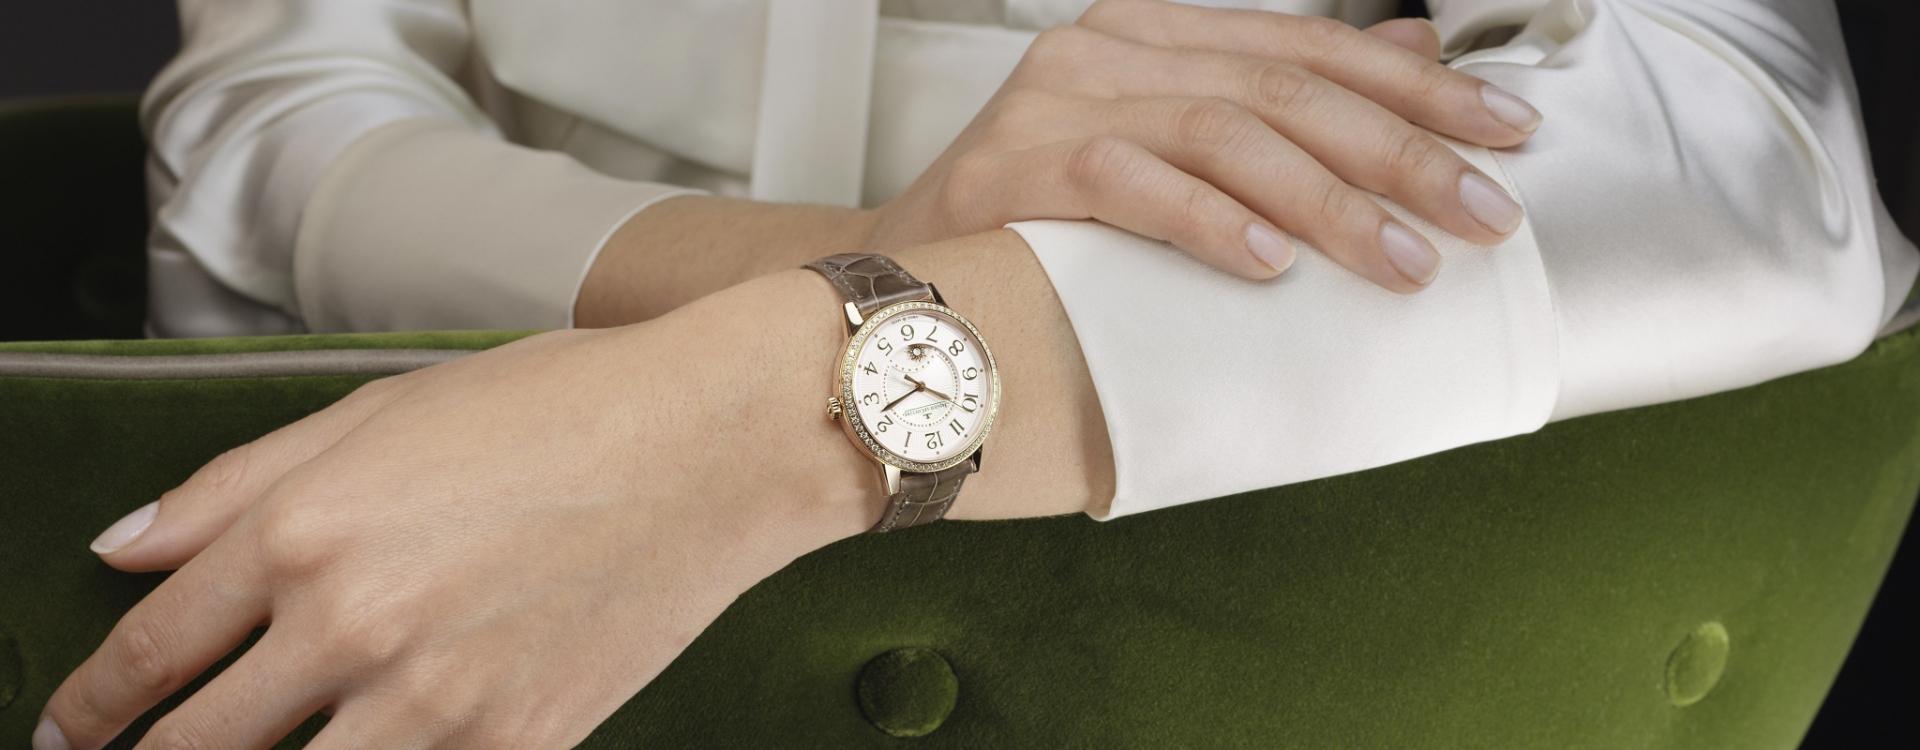 Jaeger LeCoultre Watch